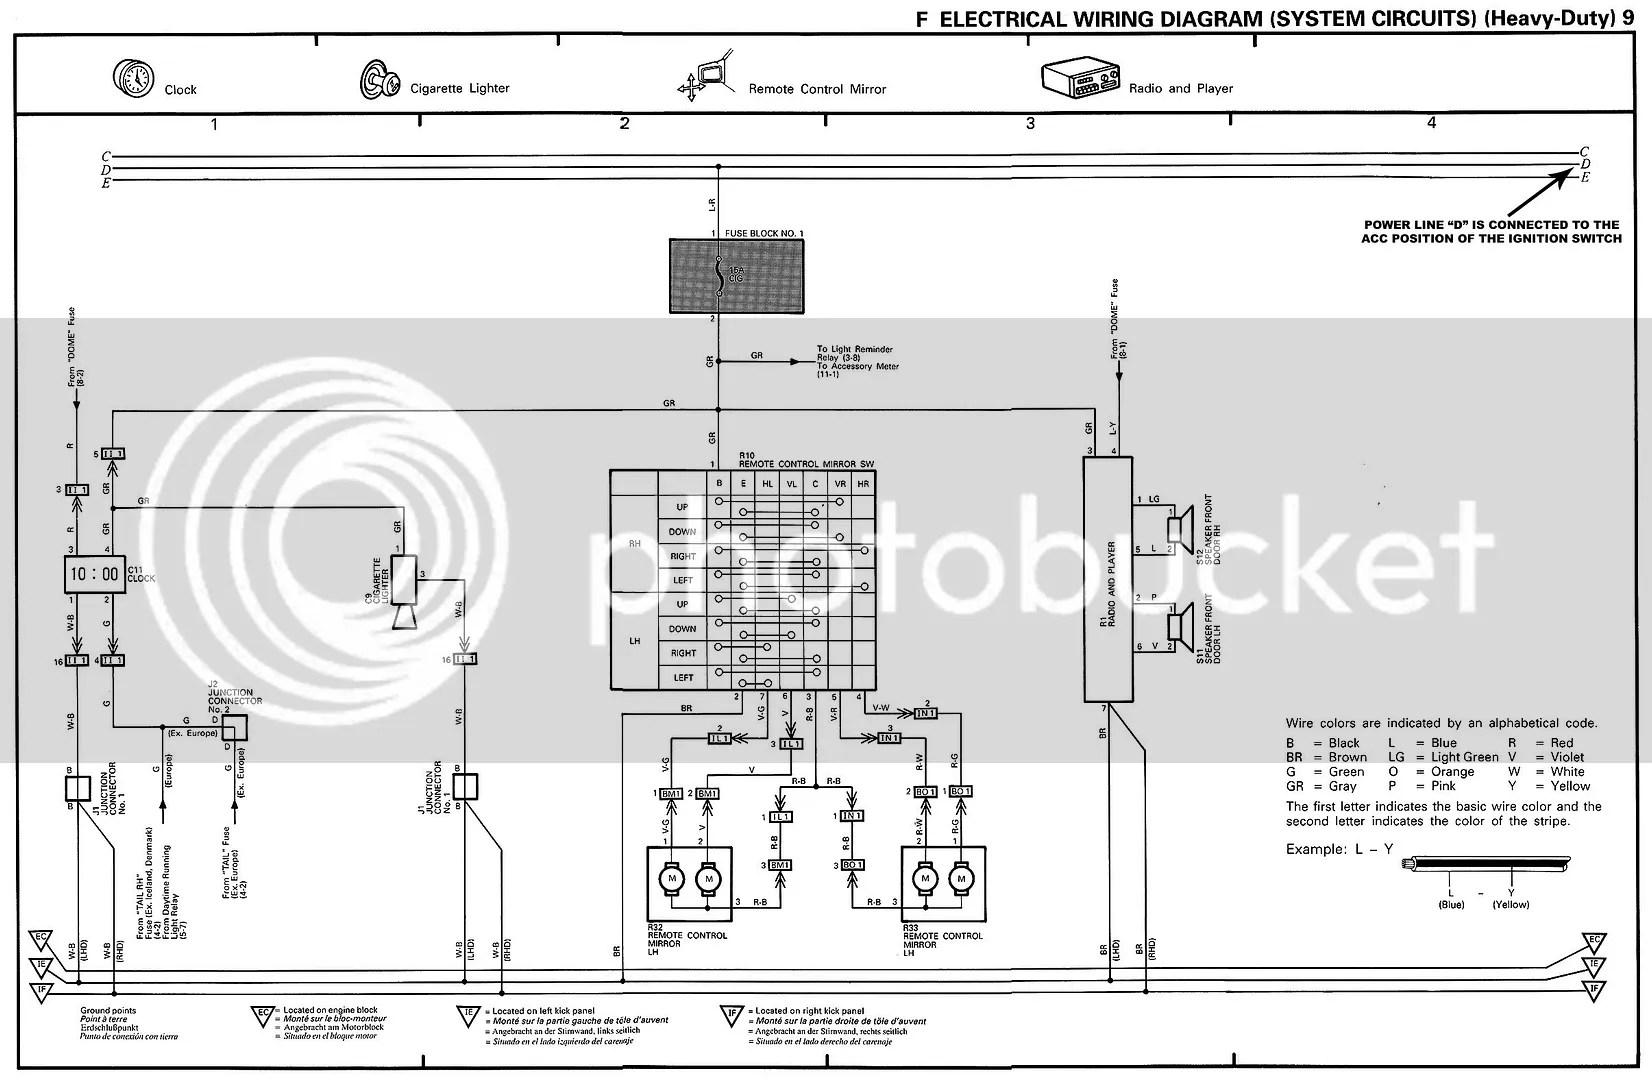 vu ute stereo wiring diagram natpe miami natpemedium resolution of vu ute stereo wiring diagram wiring diagram libraries rh w5 mo stein de